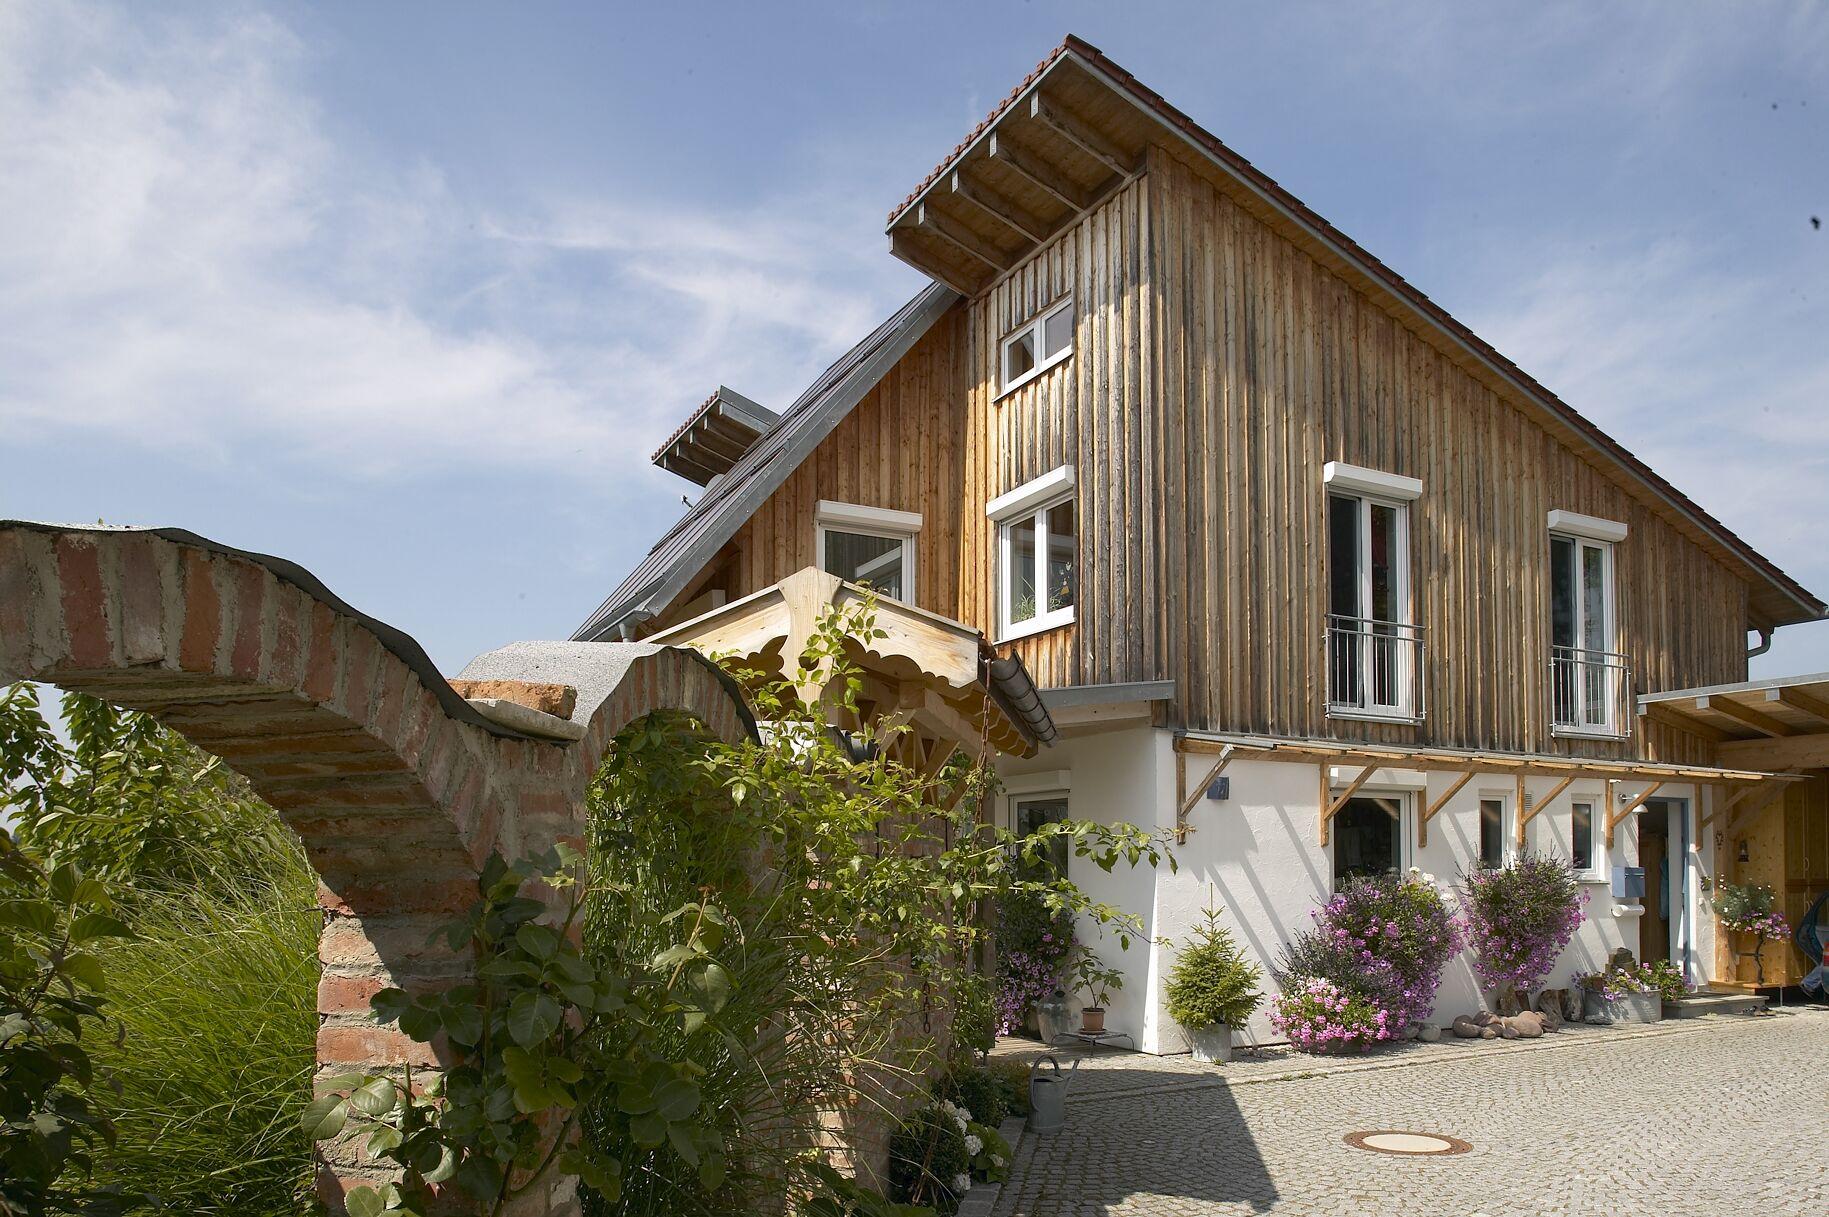 Holzhaus Edenried